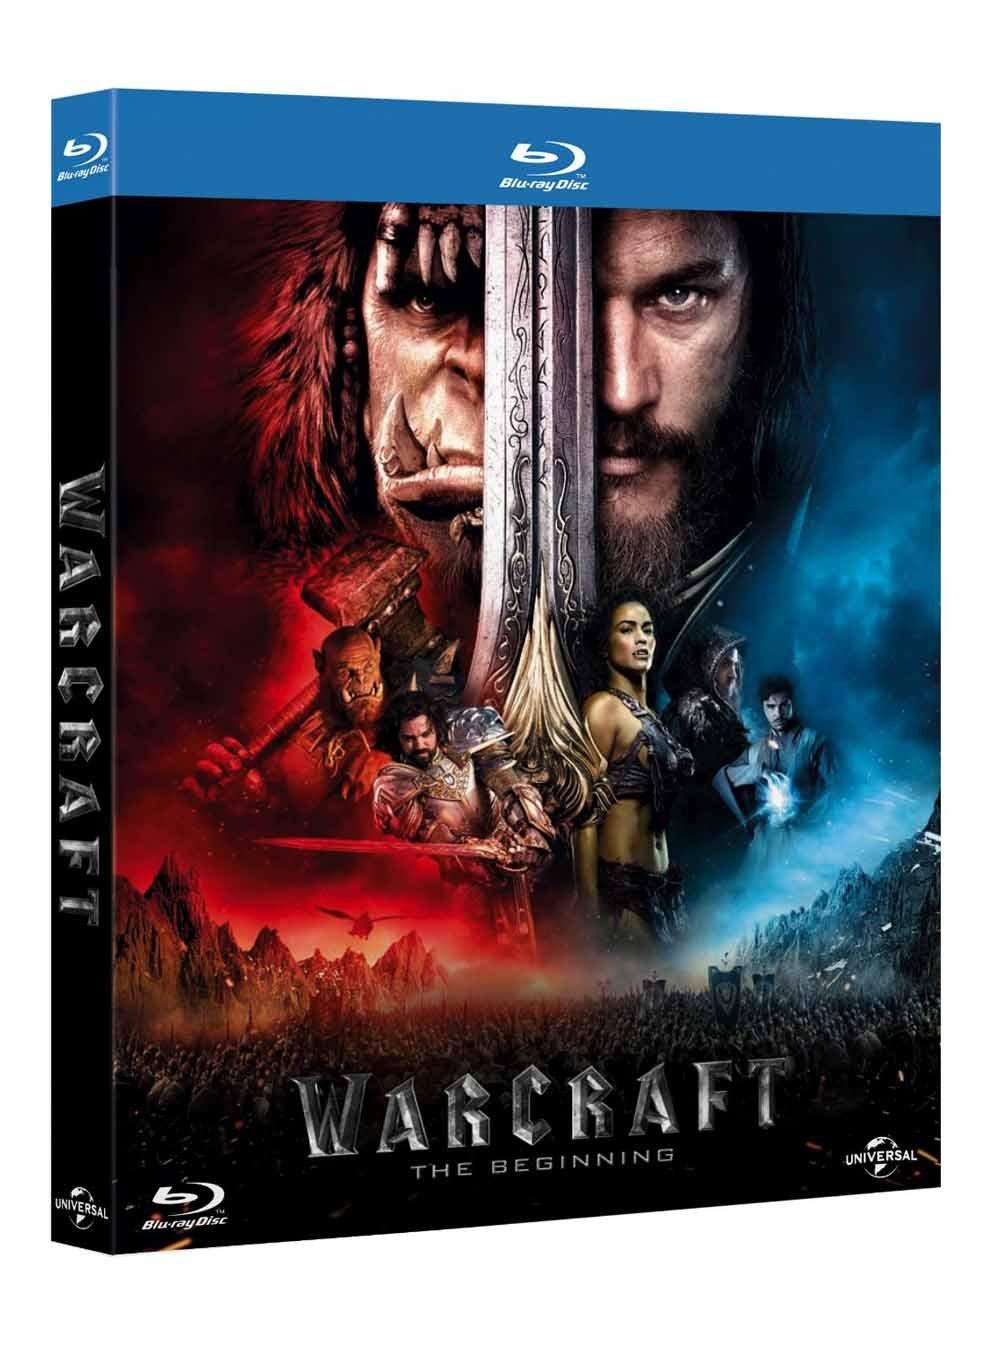 Warcraft - LInizio (Blu-Ray) [Italia] [Blu-ray]: Amazon.es: Clancy Brown, Travis Fimmel, Toby Kebbell, Paula Patton, Duncan Jones, Clancy Brown, Travis Fimmel: Cine y Series TV